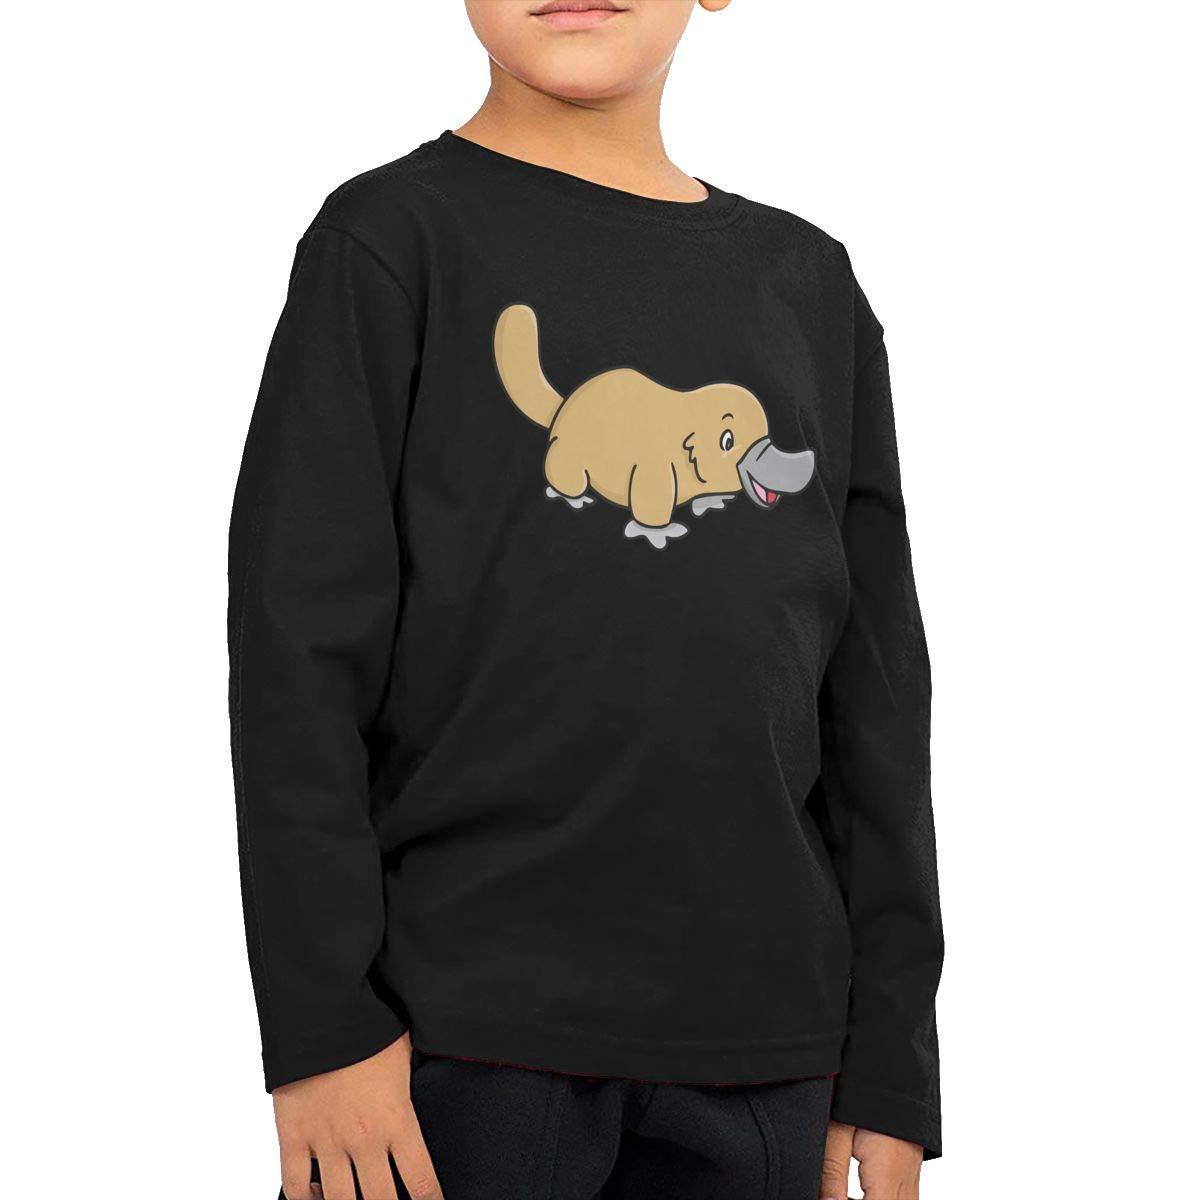 Toddler Platypus Duckbill ComfortSoft Long Sleeve Tee